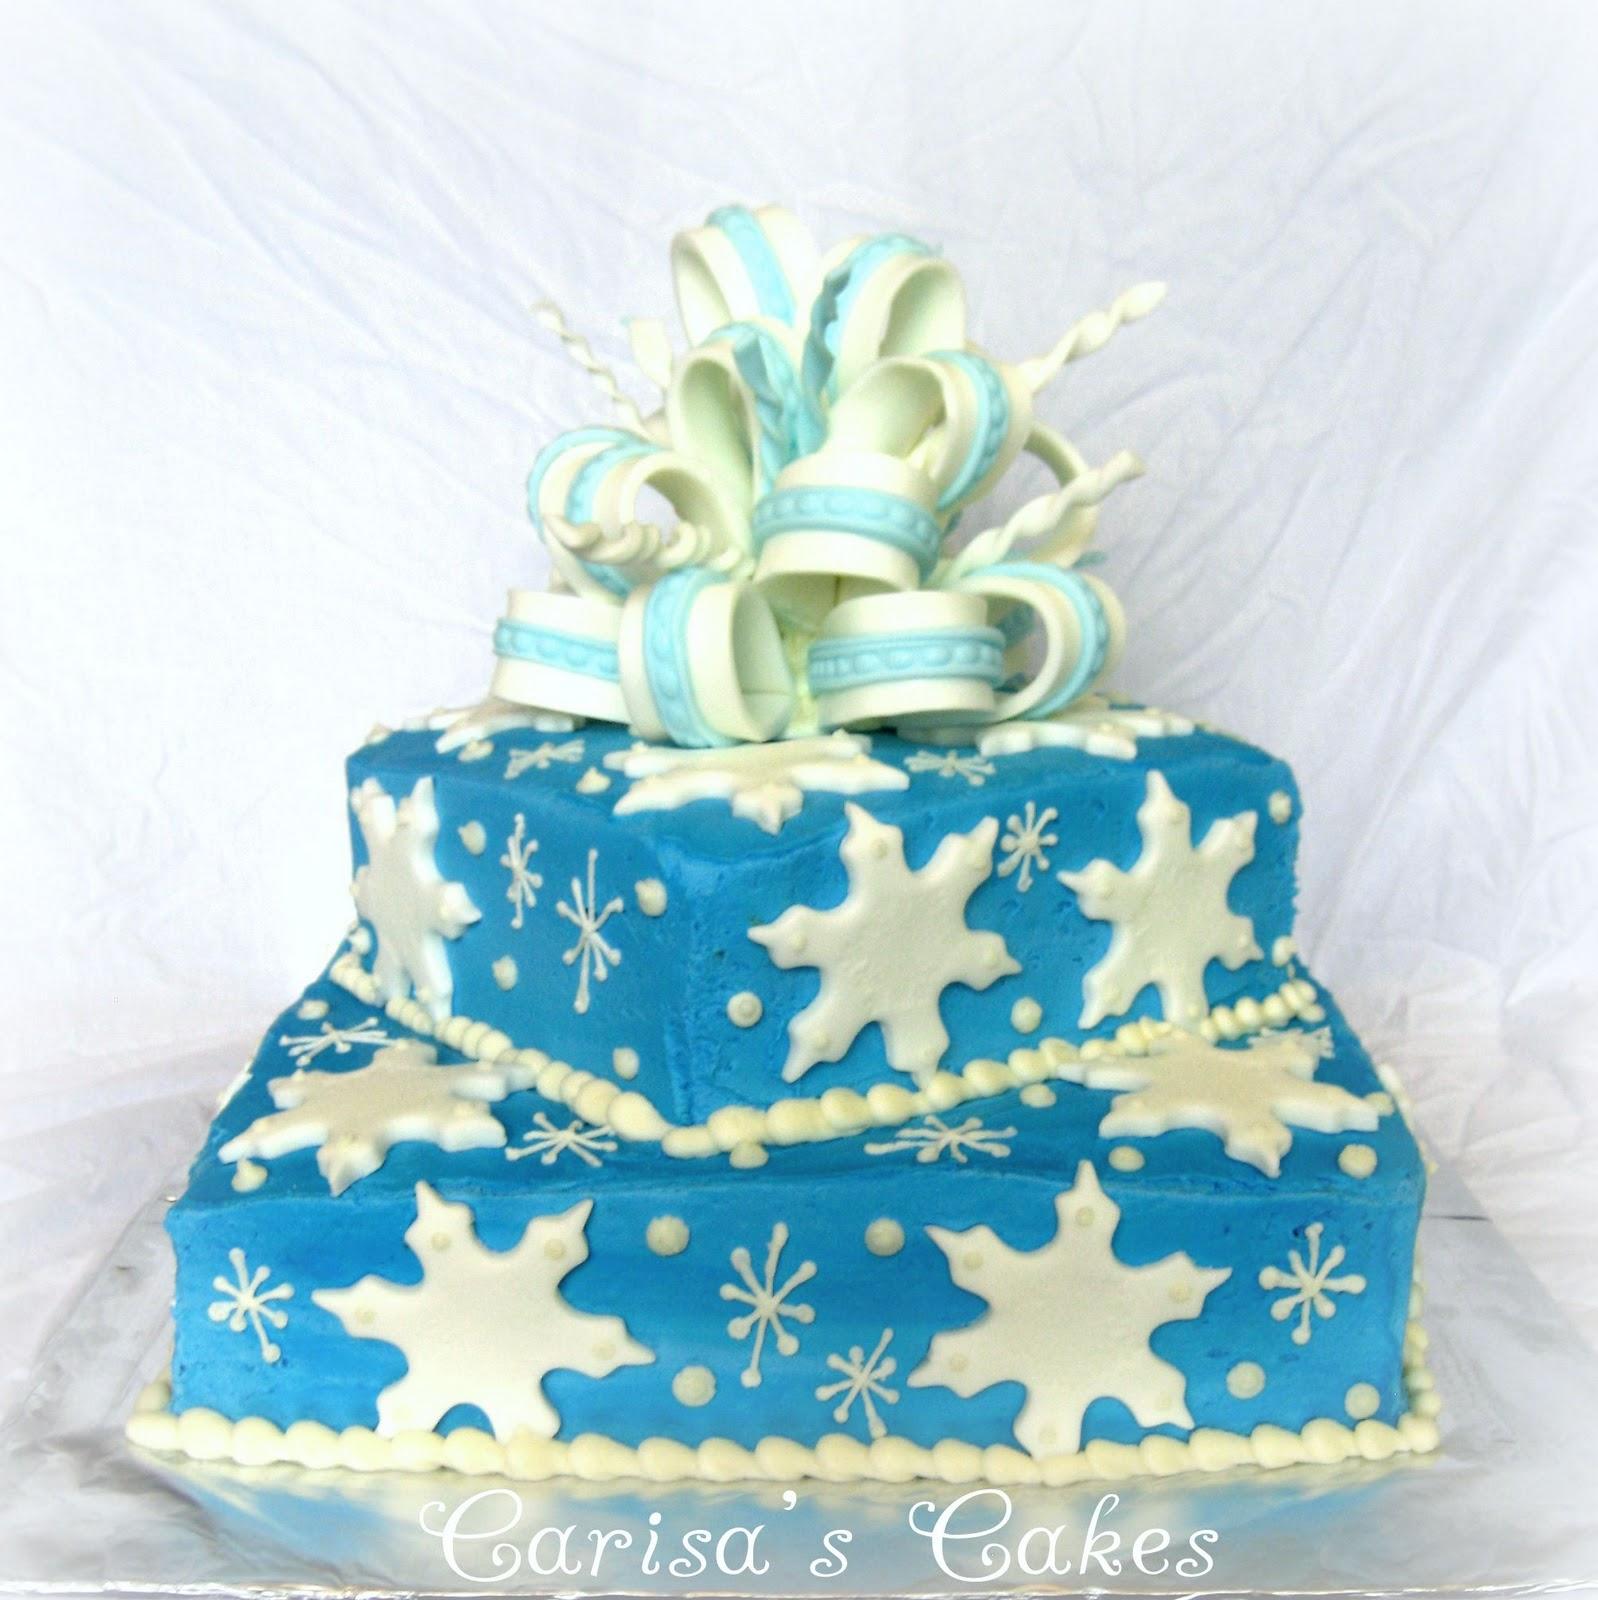 Carisa s Cakes A Winter Birthday Cake